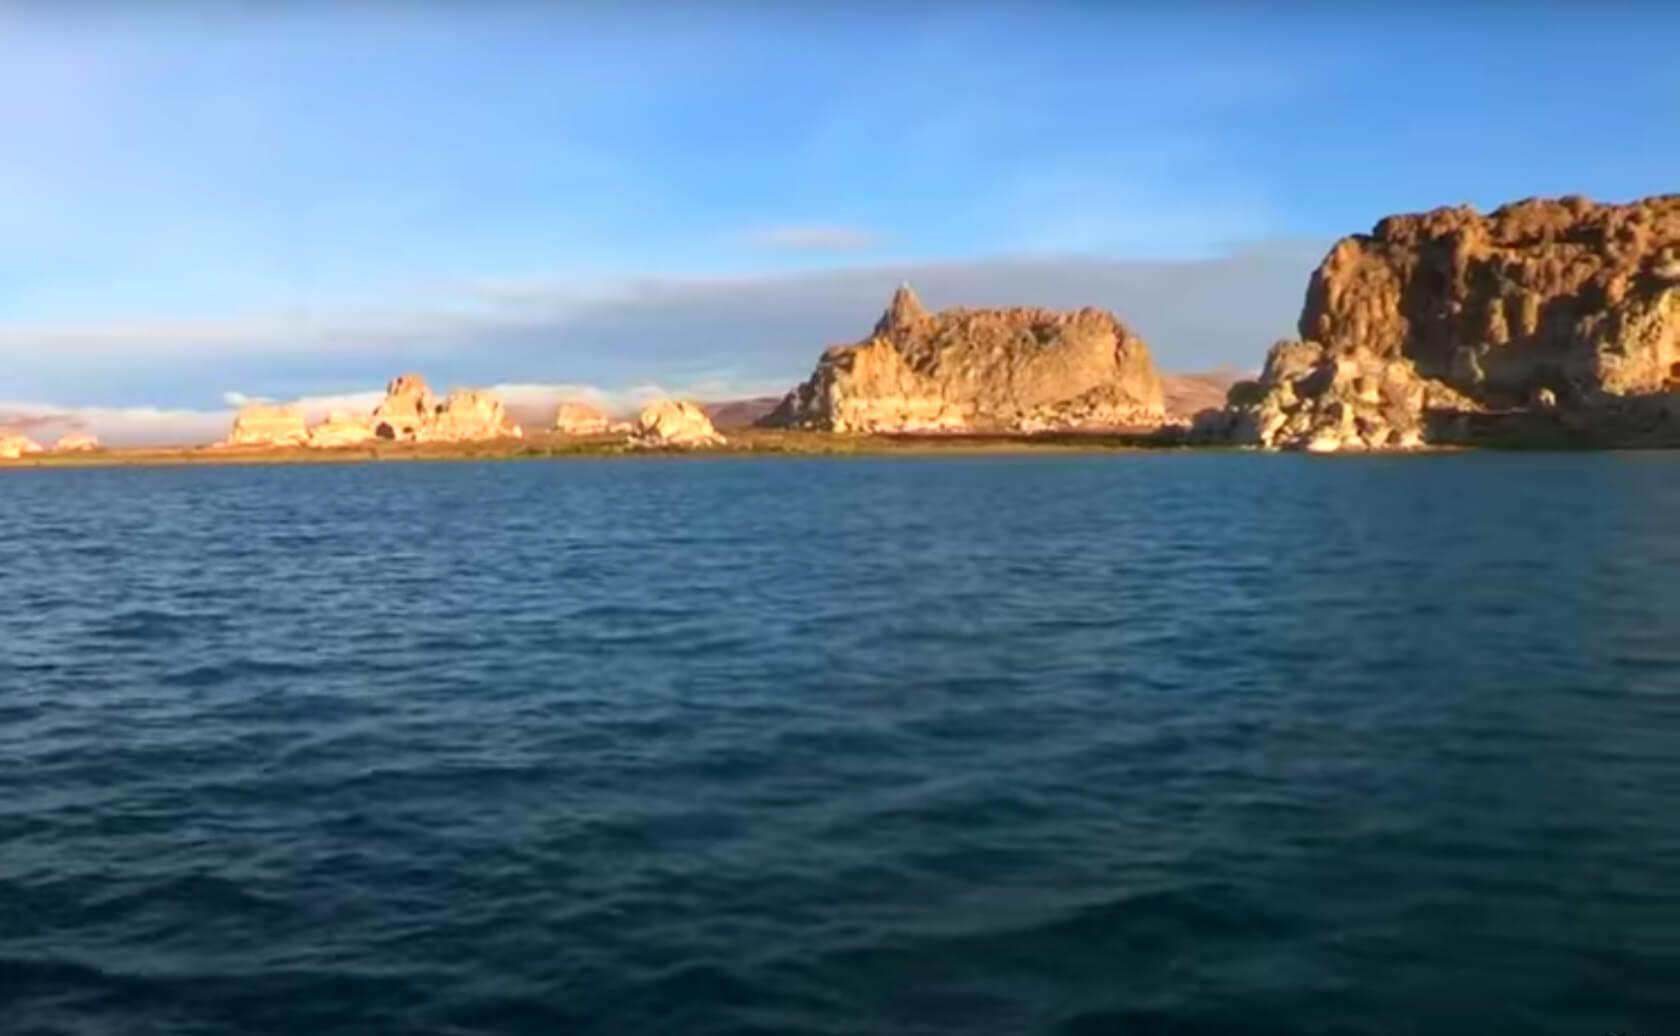 pyramid-lake-fishing-guide-nv-01 copy 6